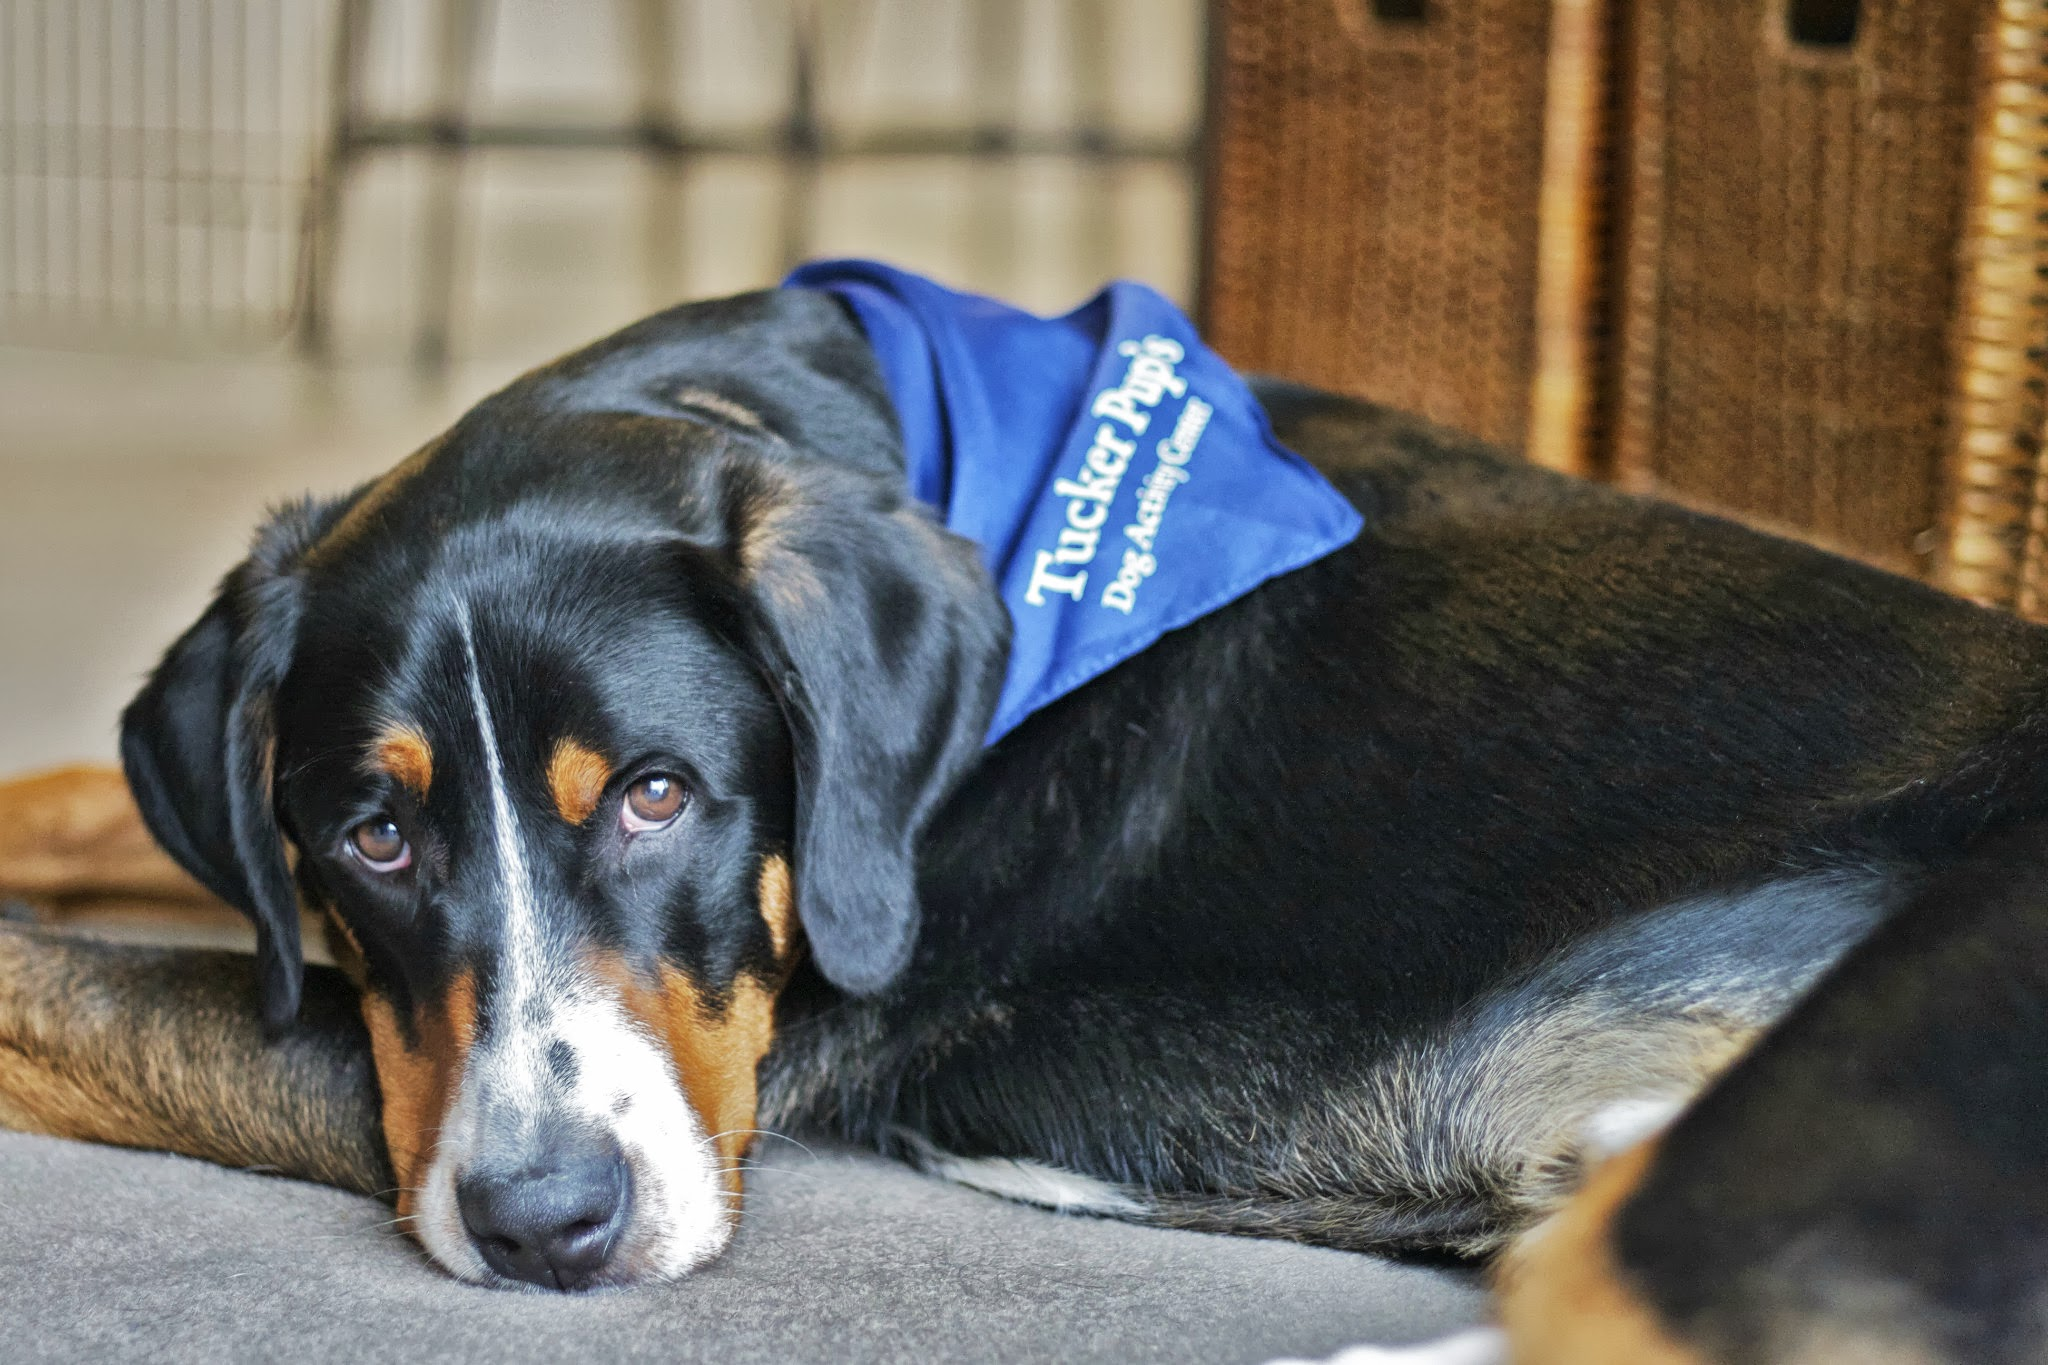 Classy Er Swiss Mountain Dog Sad Dog Diary Sad Dog Diary Simply Social Blog Sad Dog Diary Quotes Sad Dog Diary Zefrank bark post Sad Dog Diary